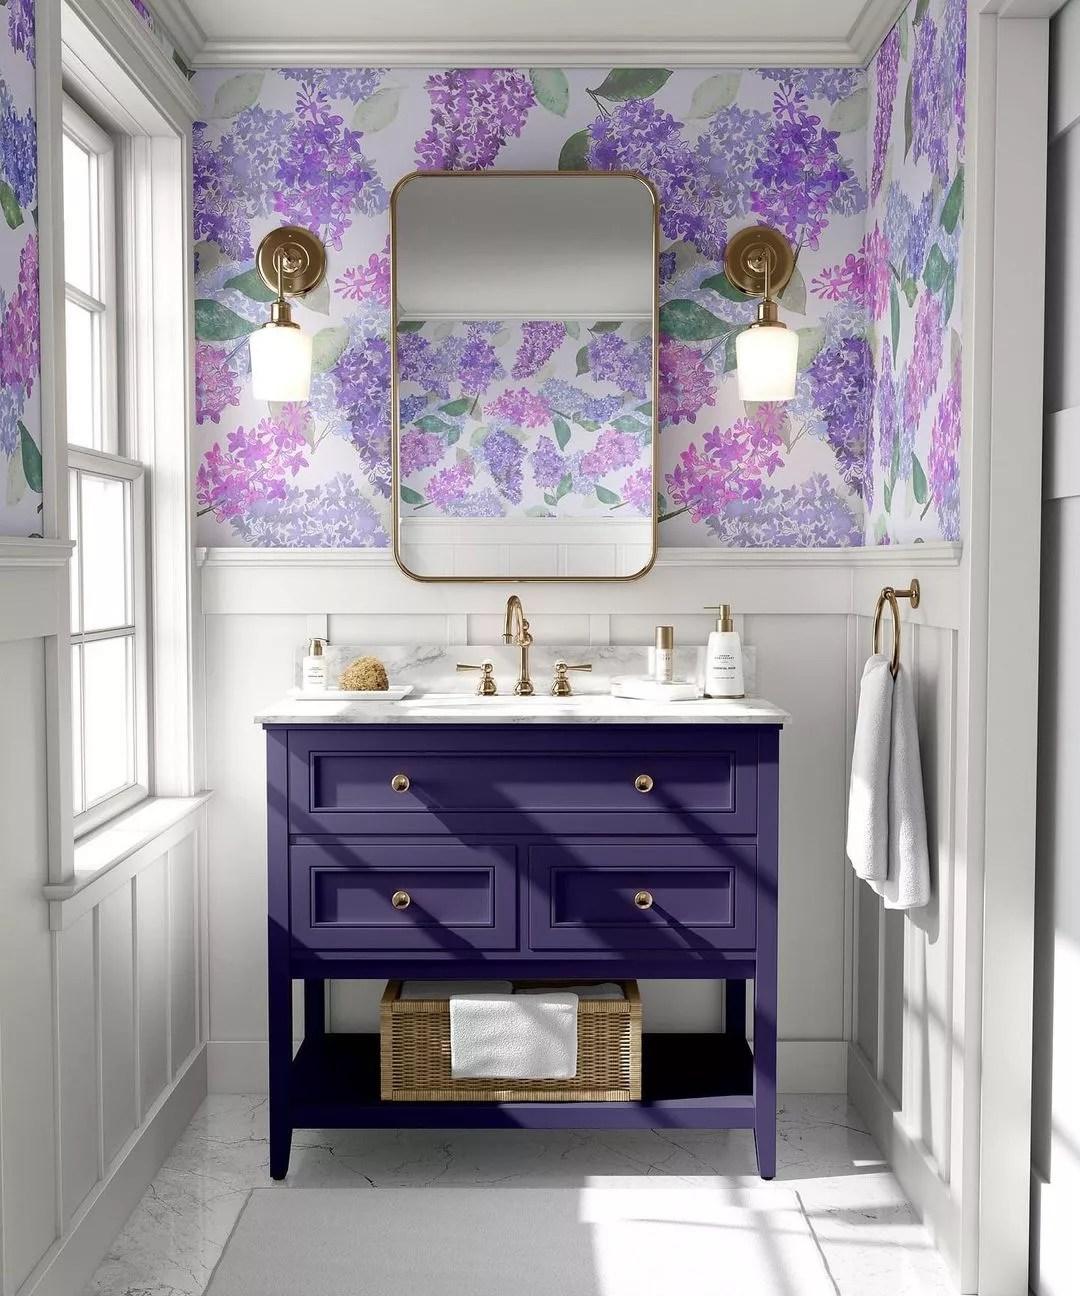 Eco-friendly floral pattern bathroom wallpaper. Photo by Instagram user @miurio_textiles